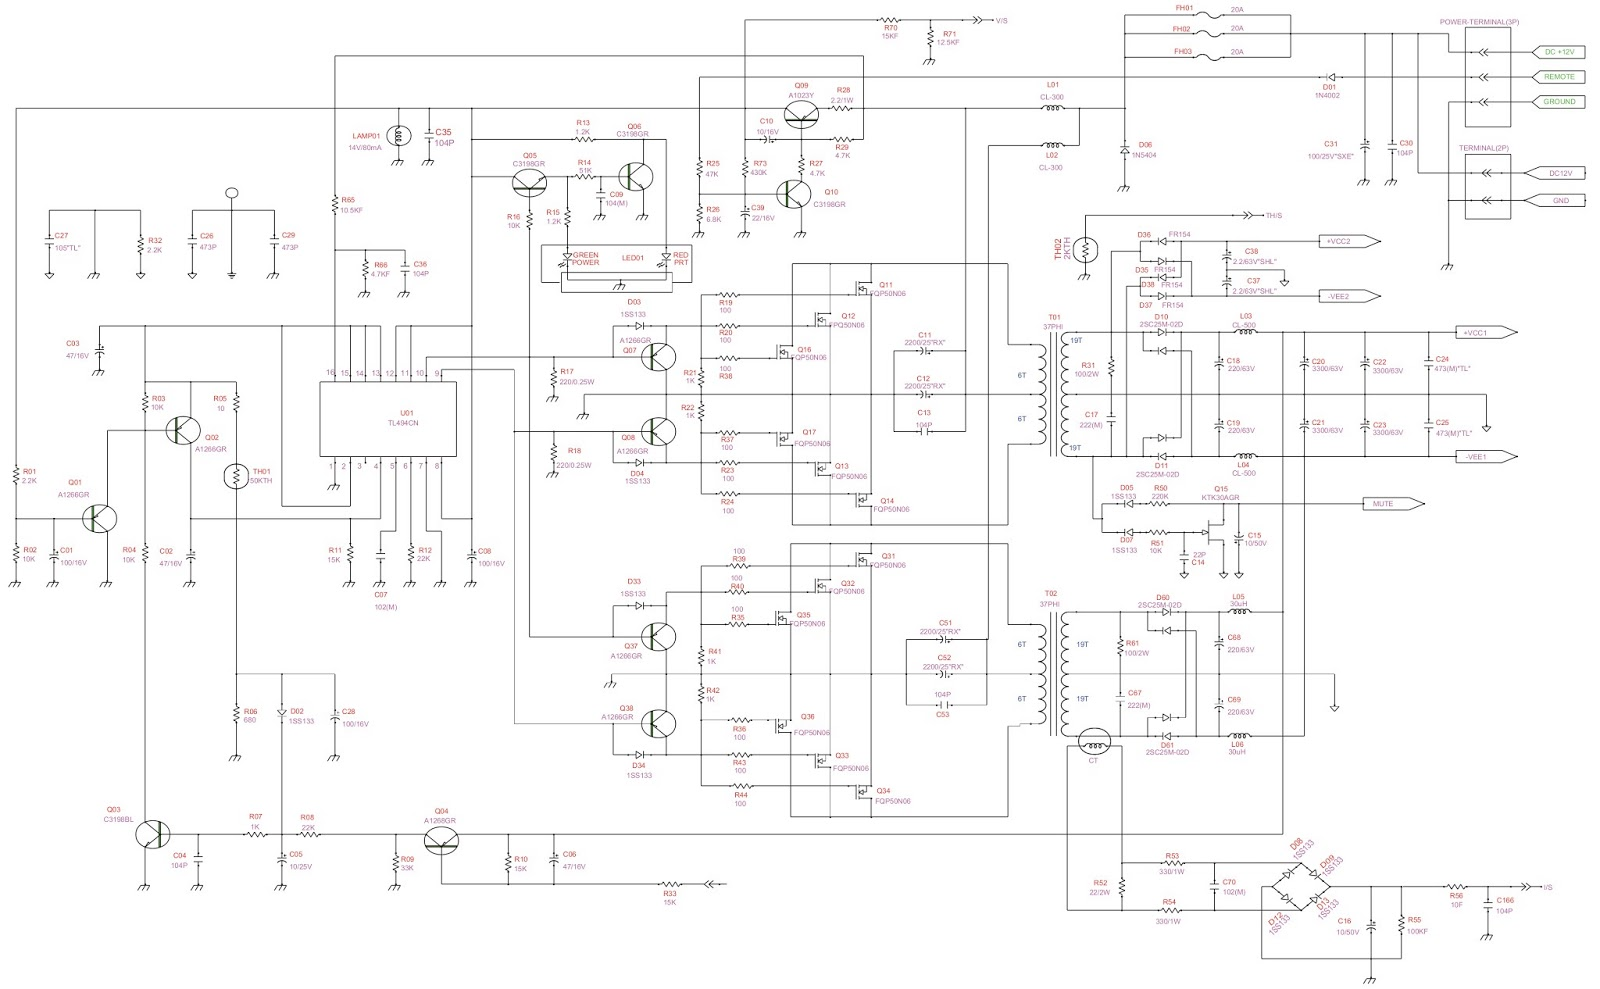 manualguide alpine 2 channel amp wire diagram rh whizenterprise co uk [ 1600 x 989 Pixel ]